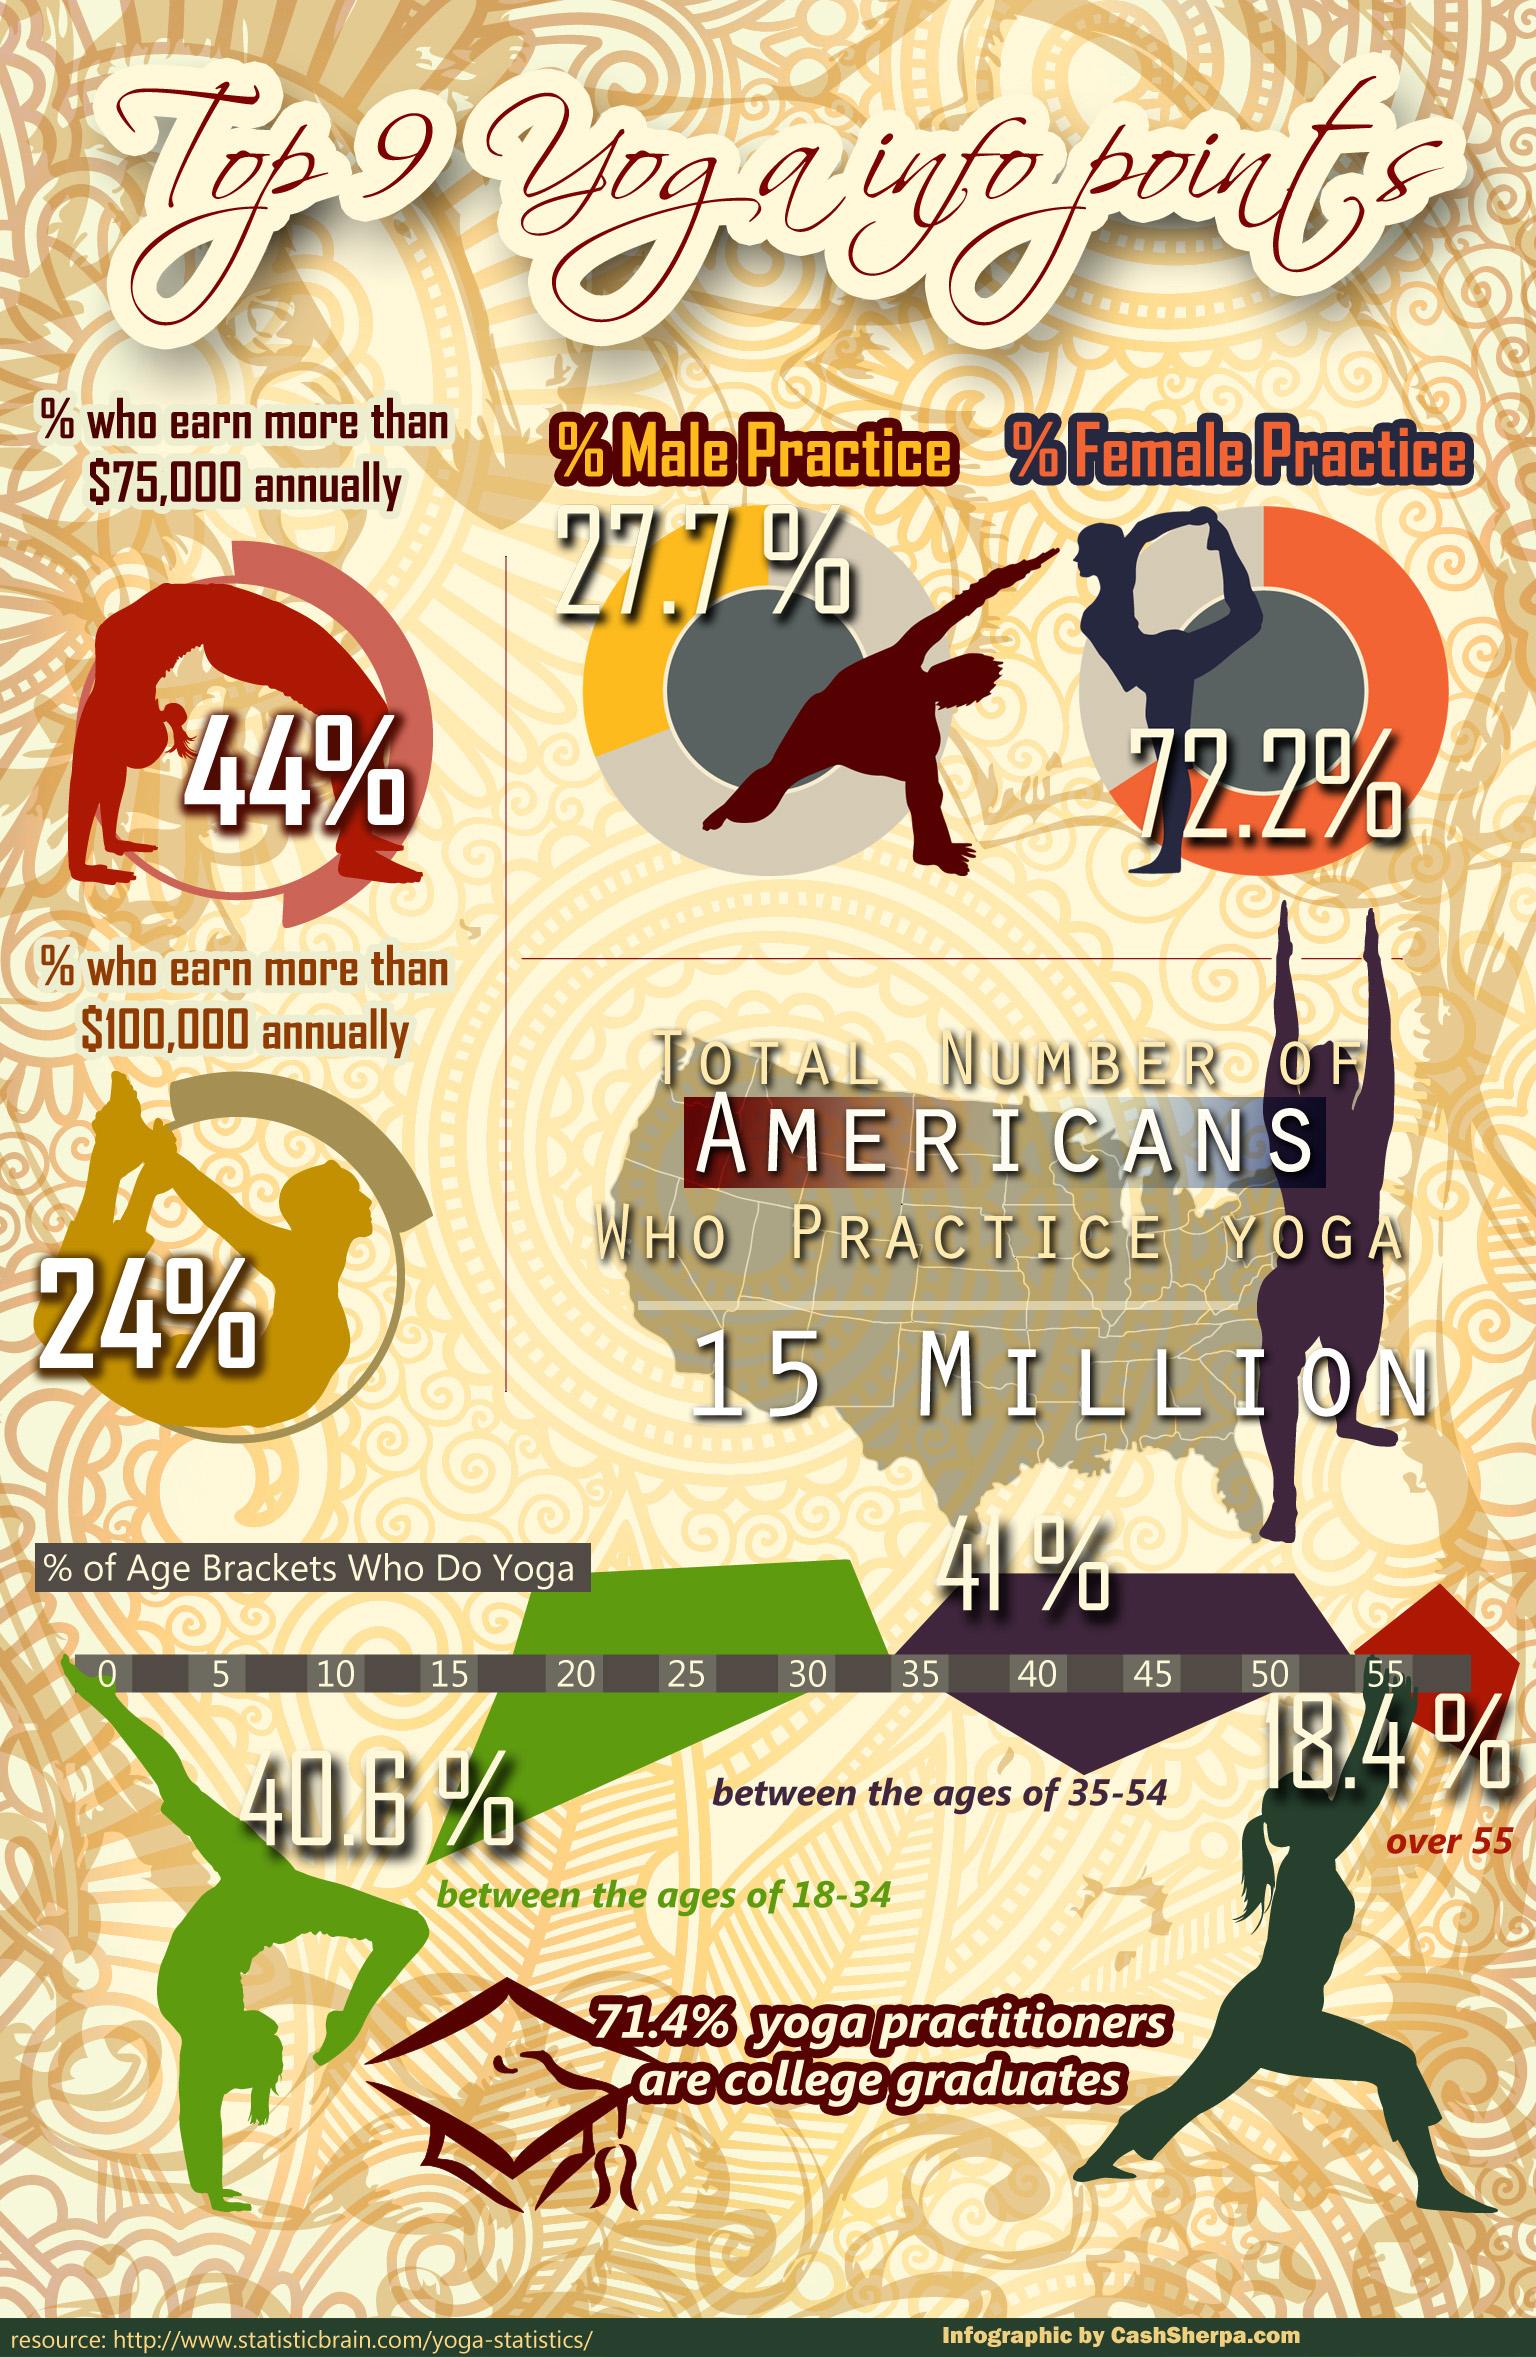 12 Yoga-infographic